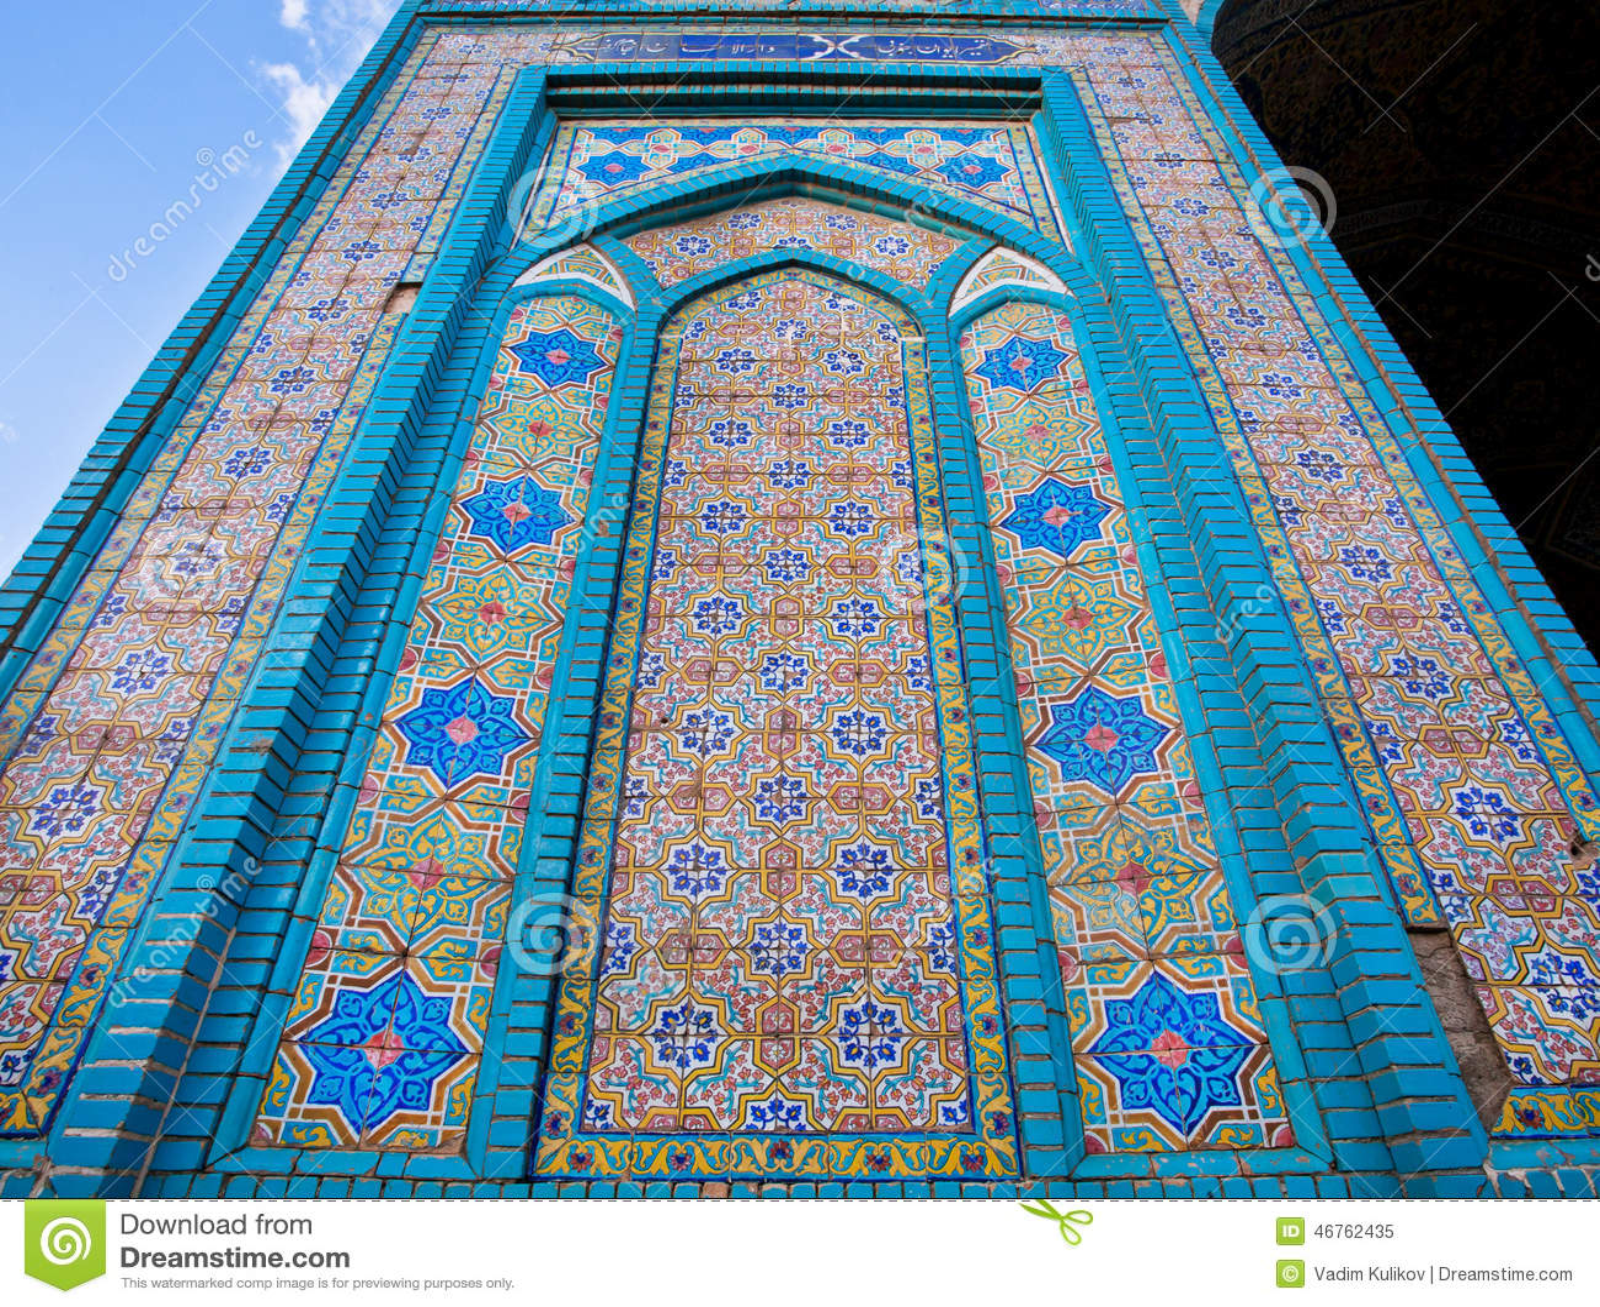 Worldly Rise Iran Art And Literature